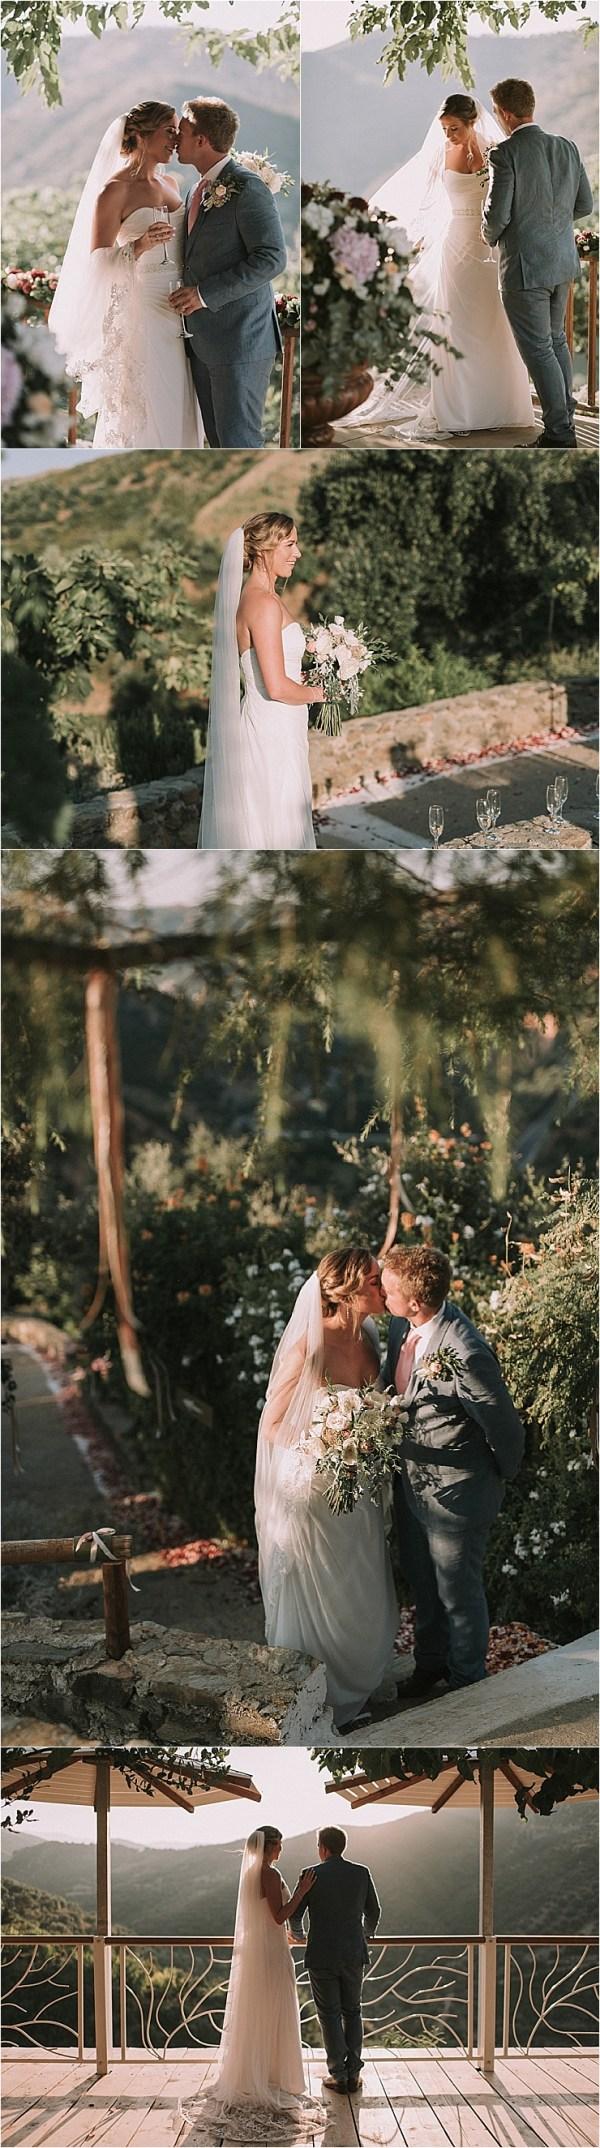 Botanical Park of Crete wedding by Andreas Markakis Photography